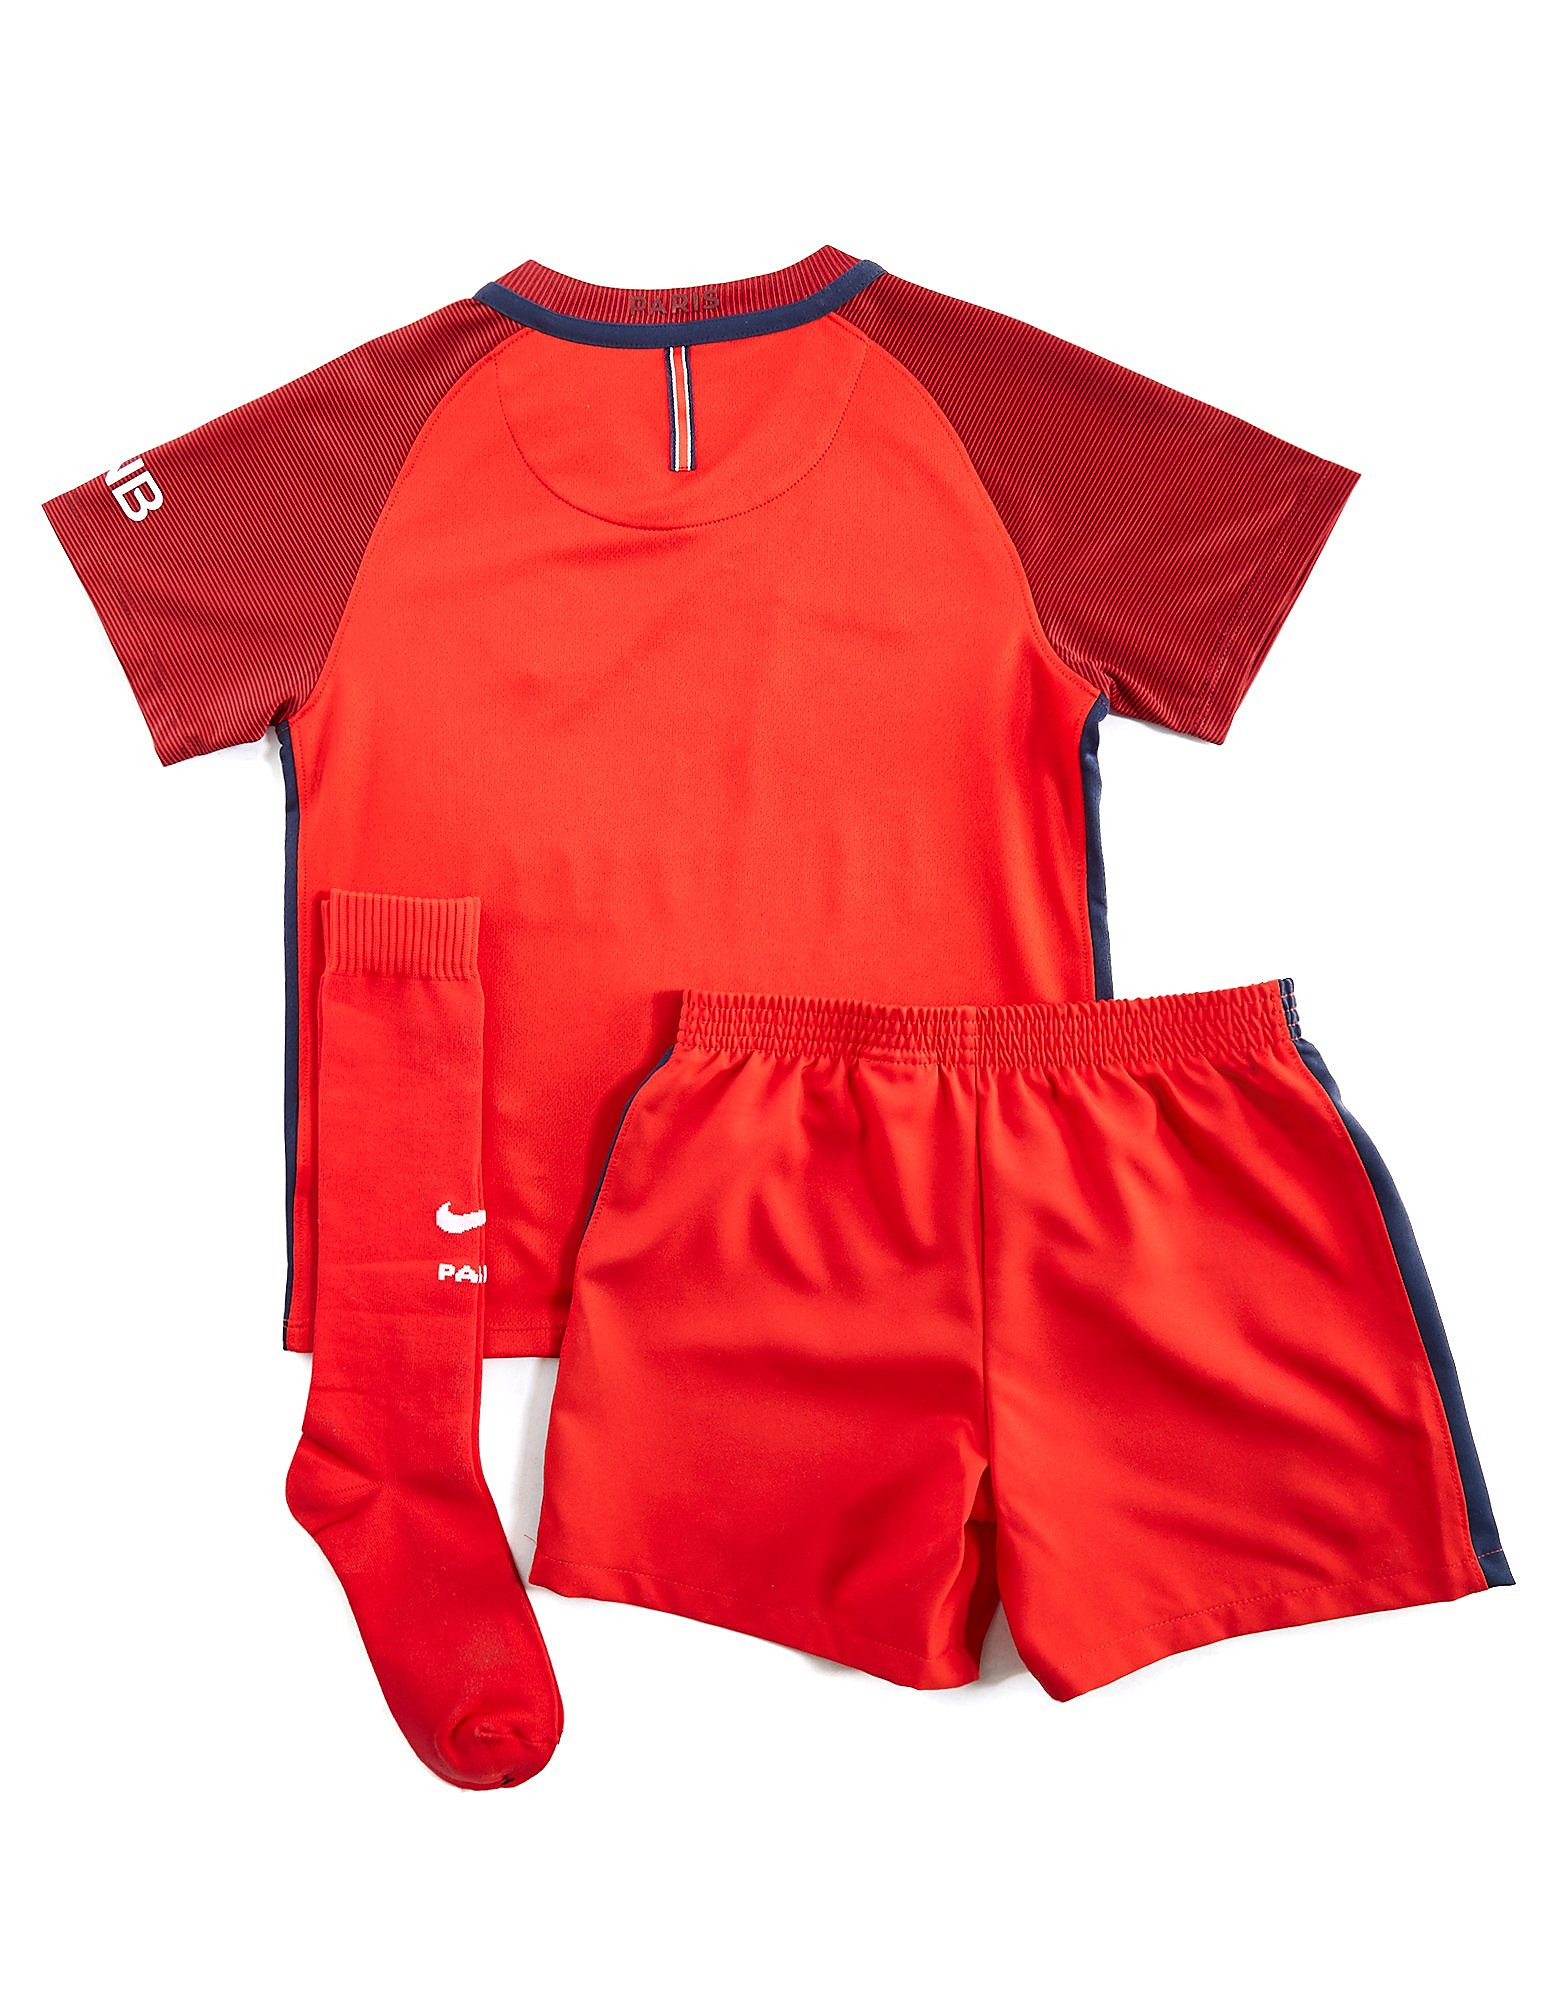 Nike Paris Saint Germain 2016/17 Junior Home Kit